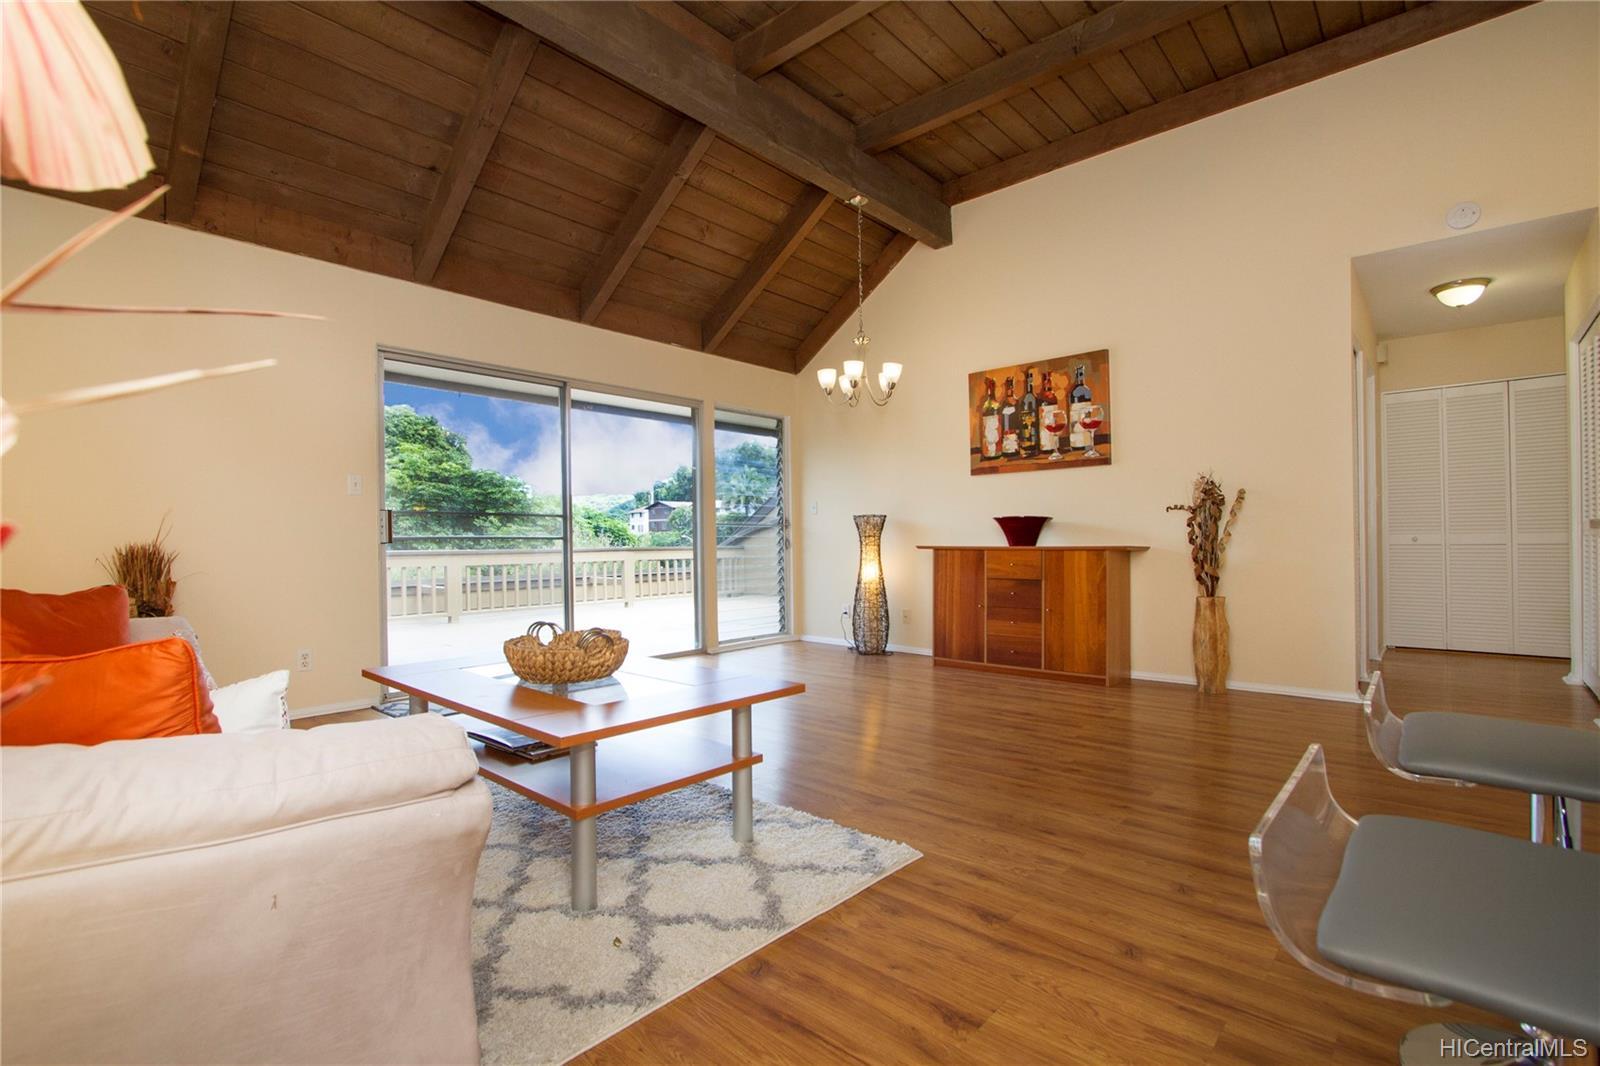 47-455 Hui Iwa Street townhouse # 33/302, Kaneohe, Hawaii - photo 4 of 20